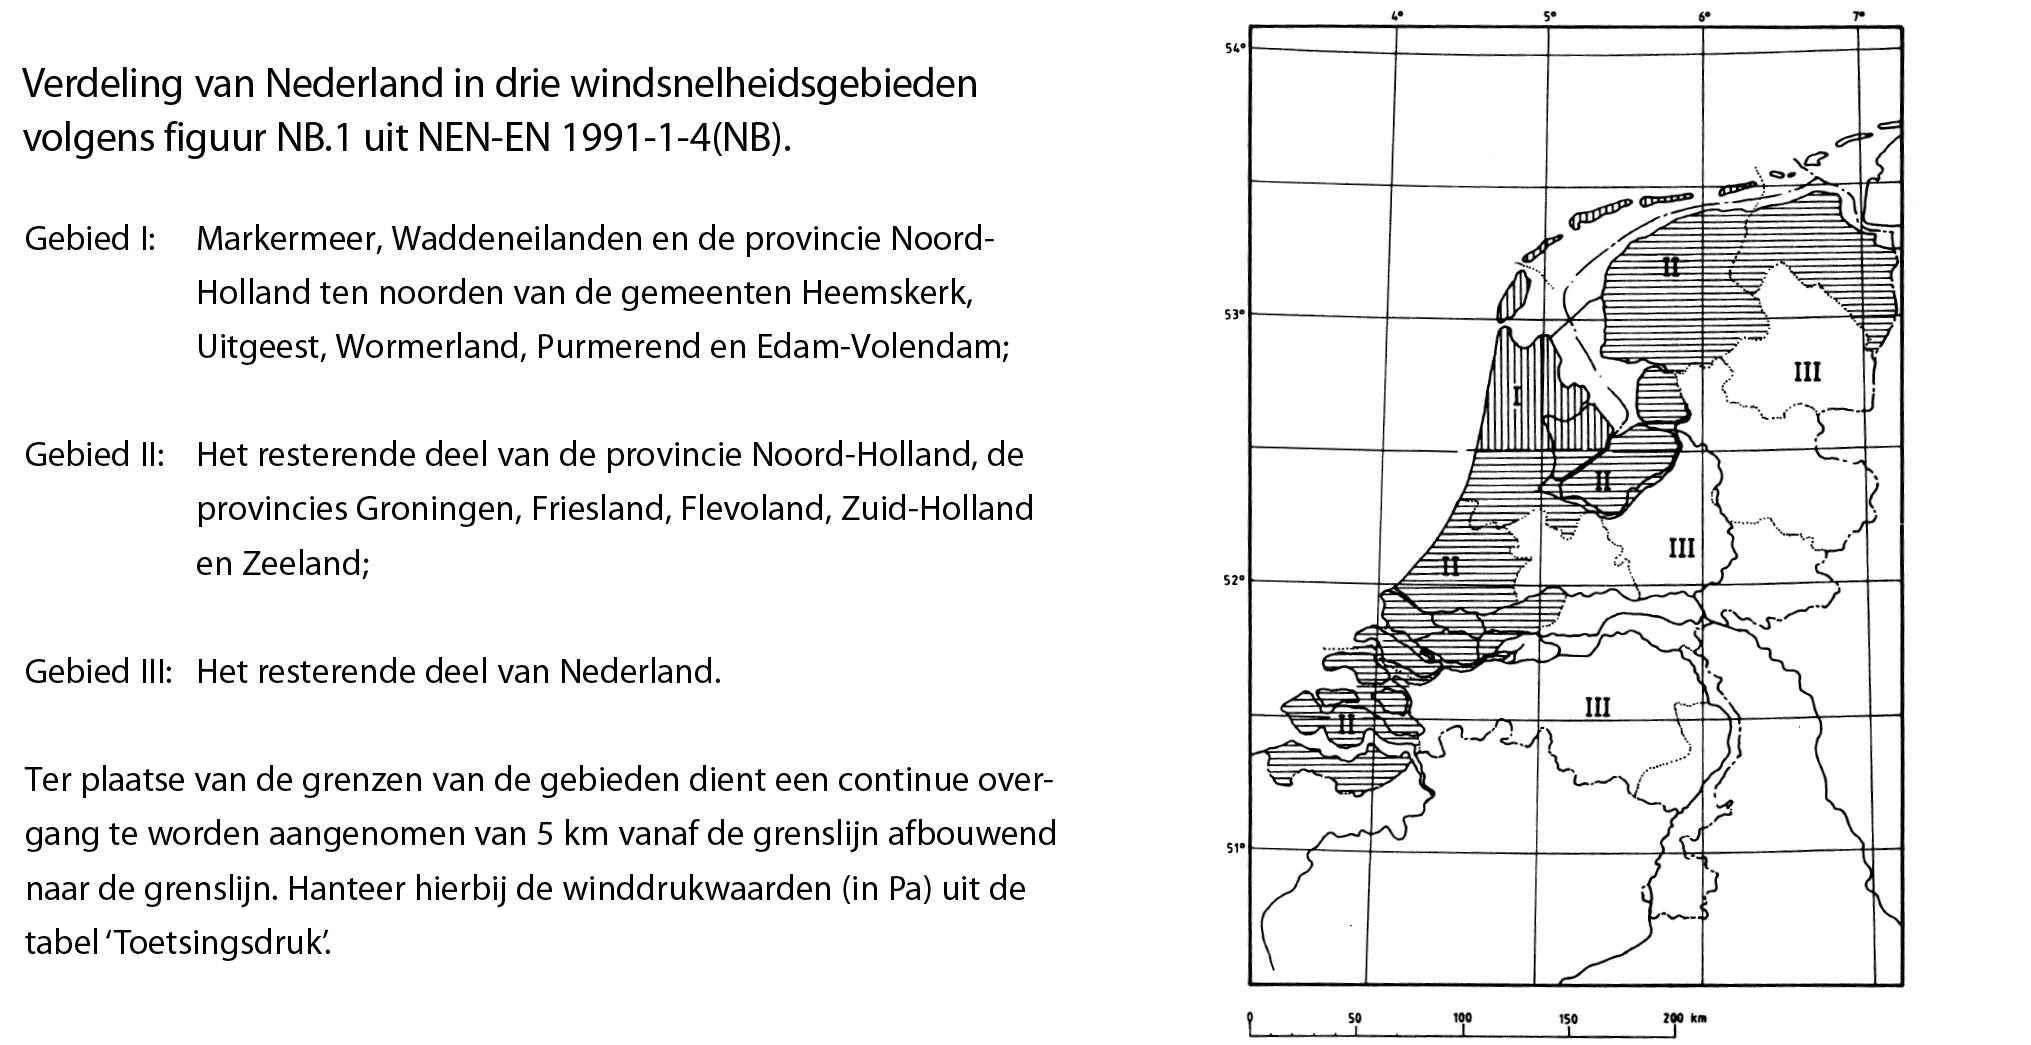 2.2.3 Aluminium_Functionele-Eisen_Luchtdoorlatendheid_Vliesgevels_WindsnelheidsgebiedenNL.jpg